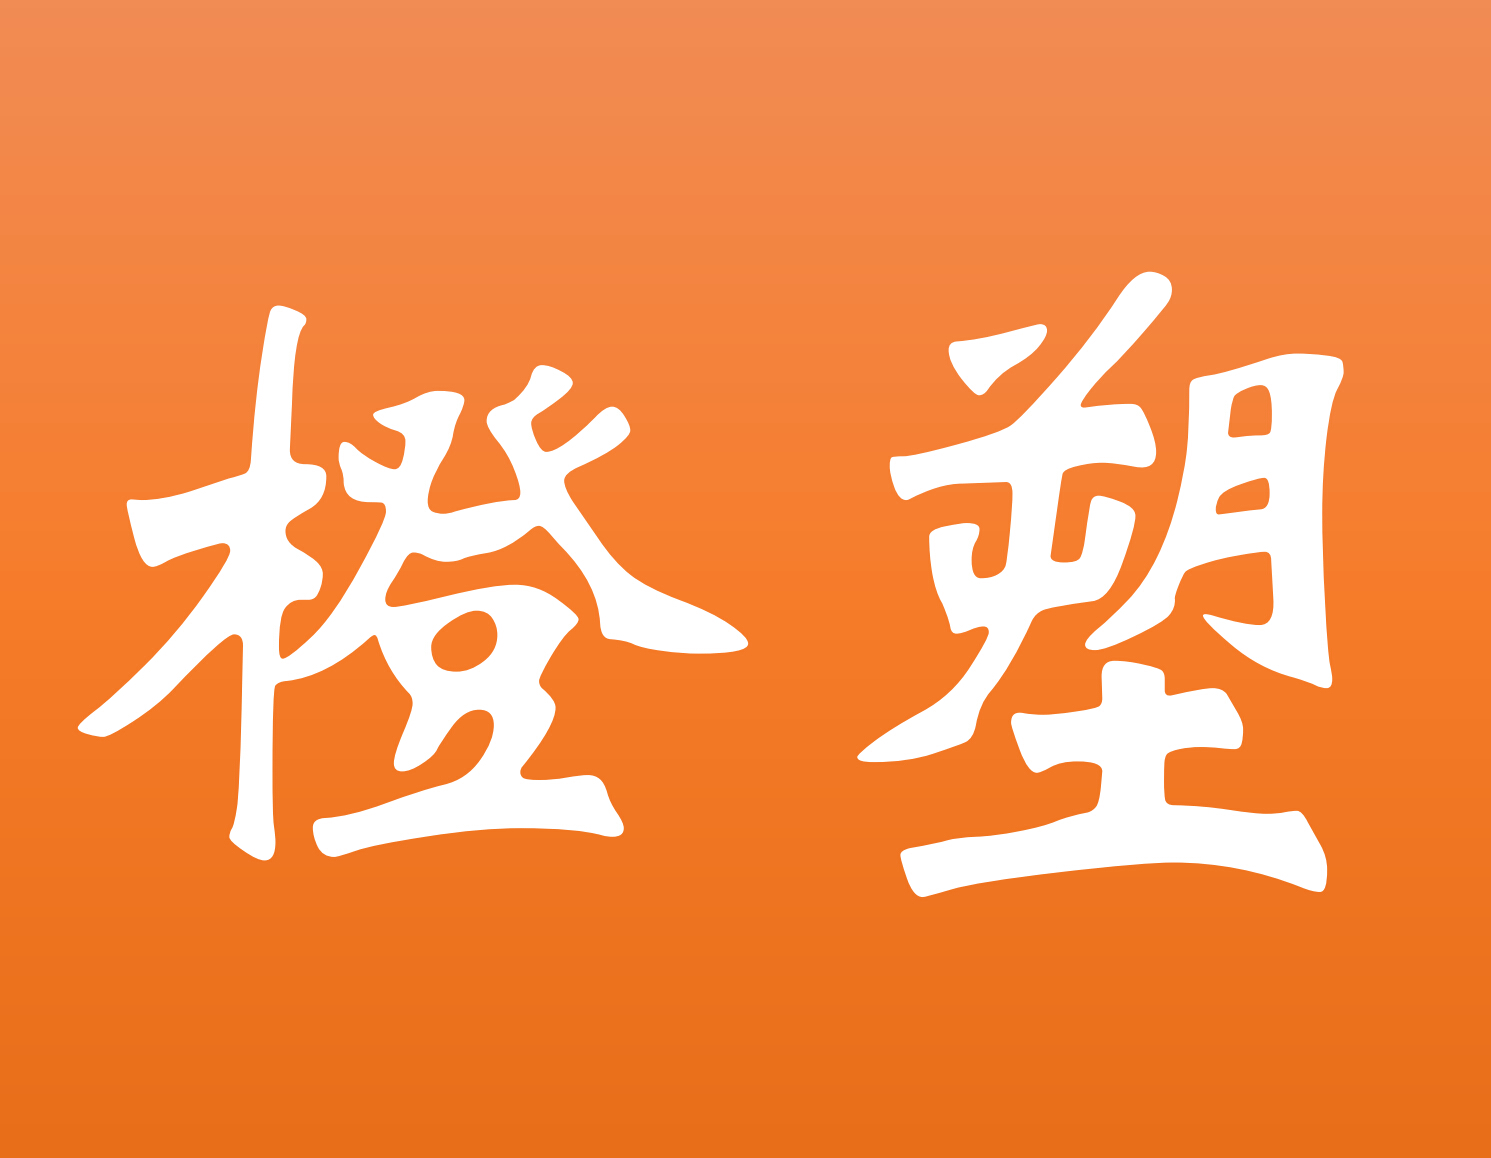 Logo-橙色底色